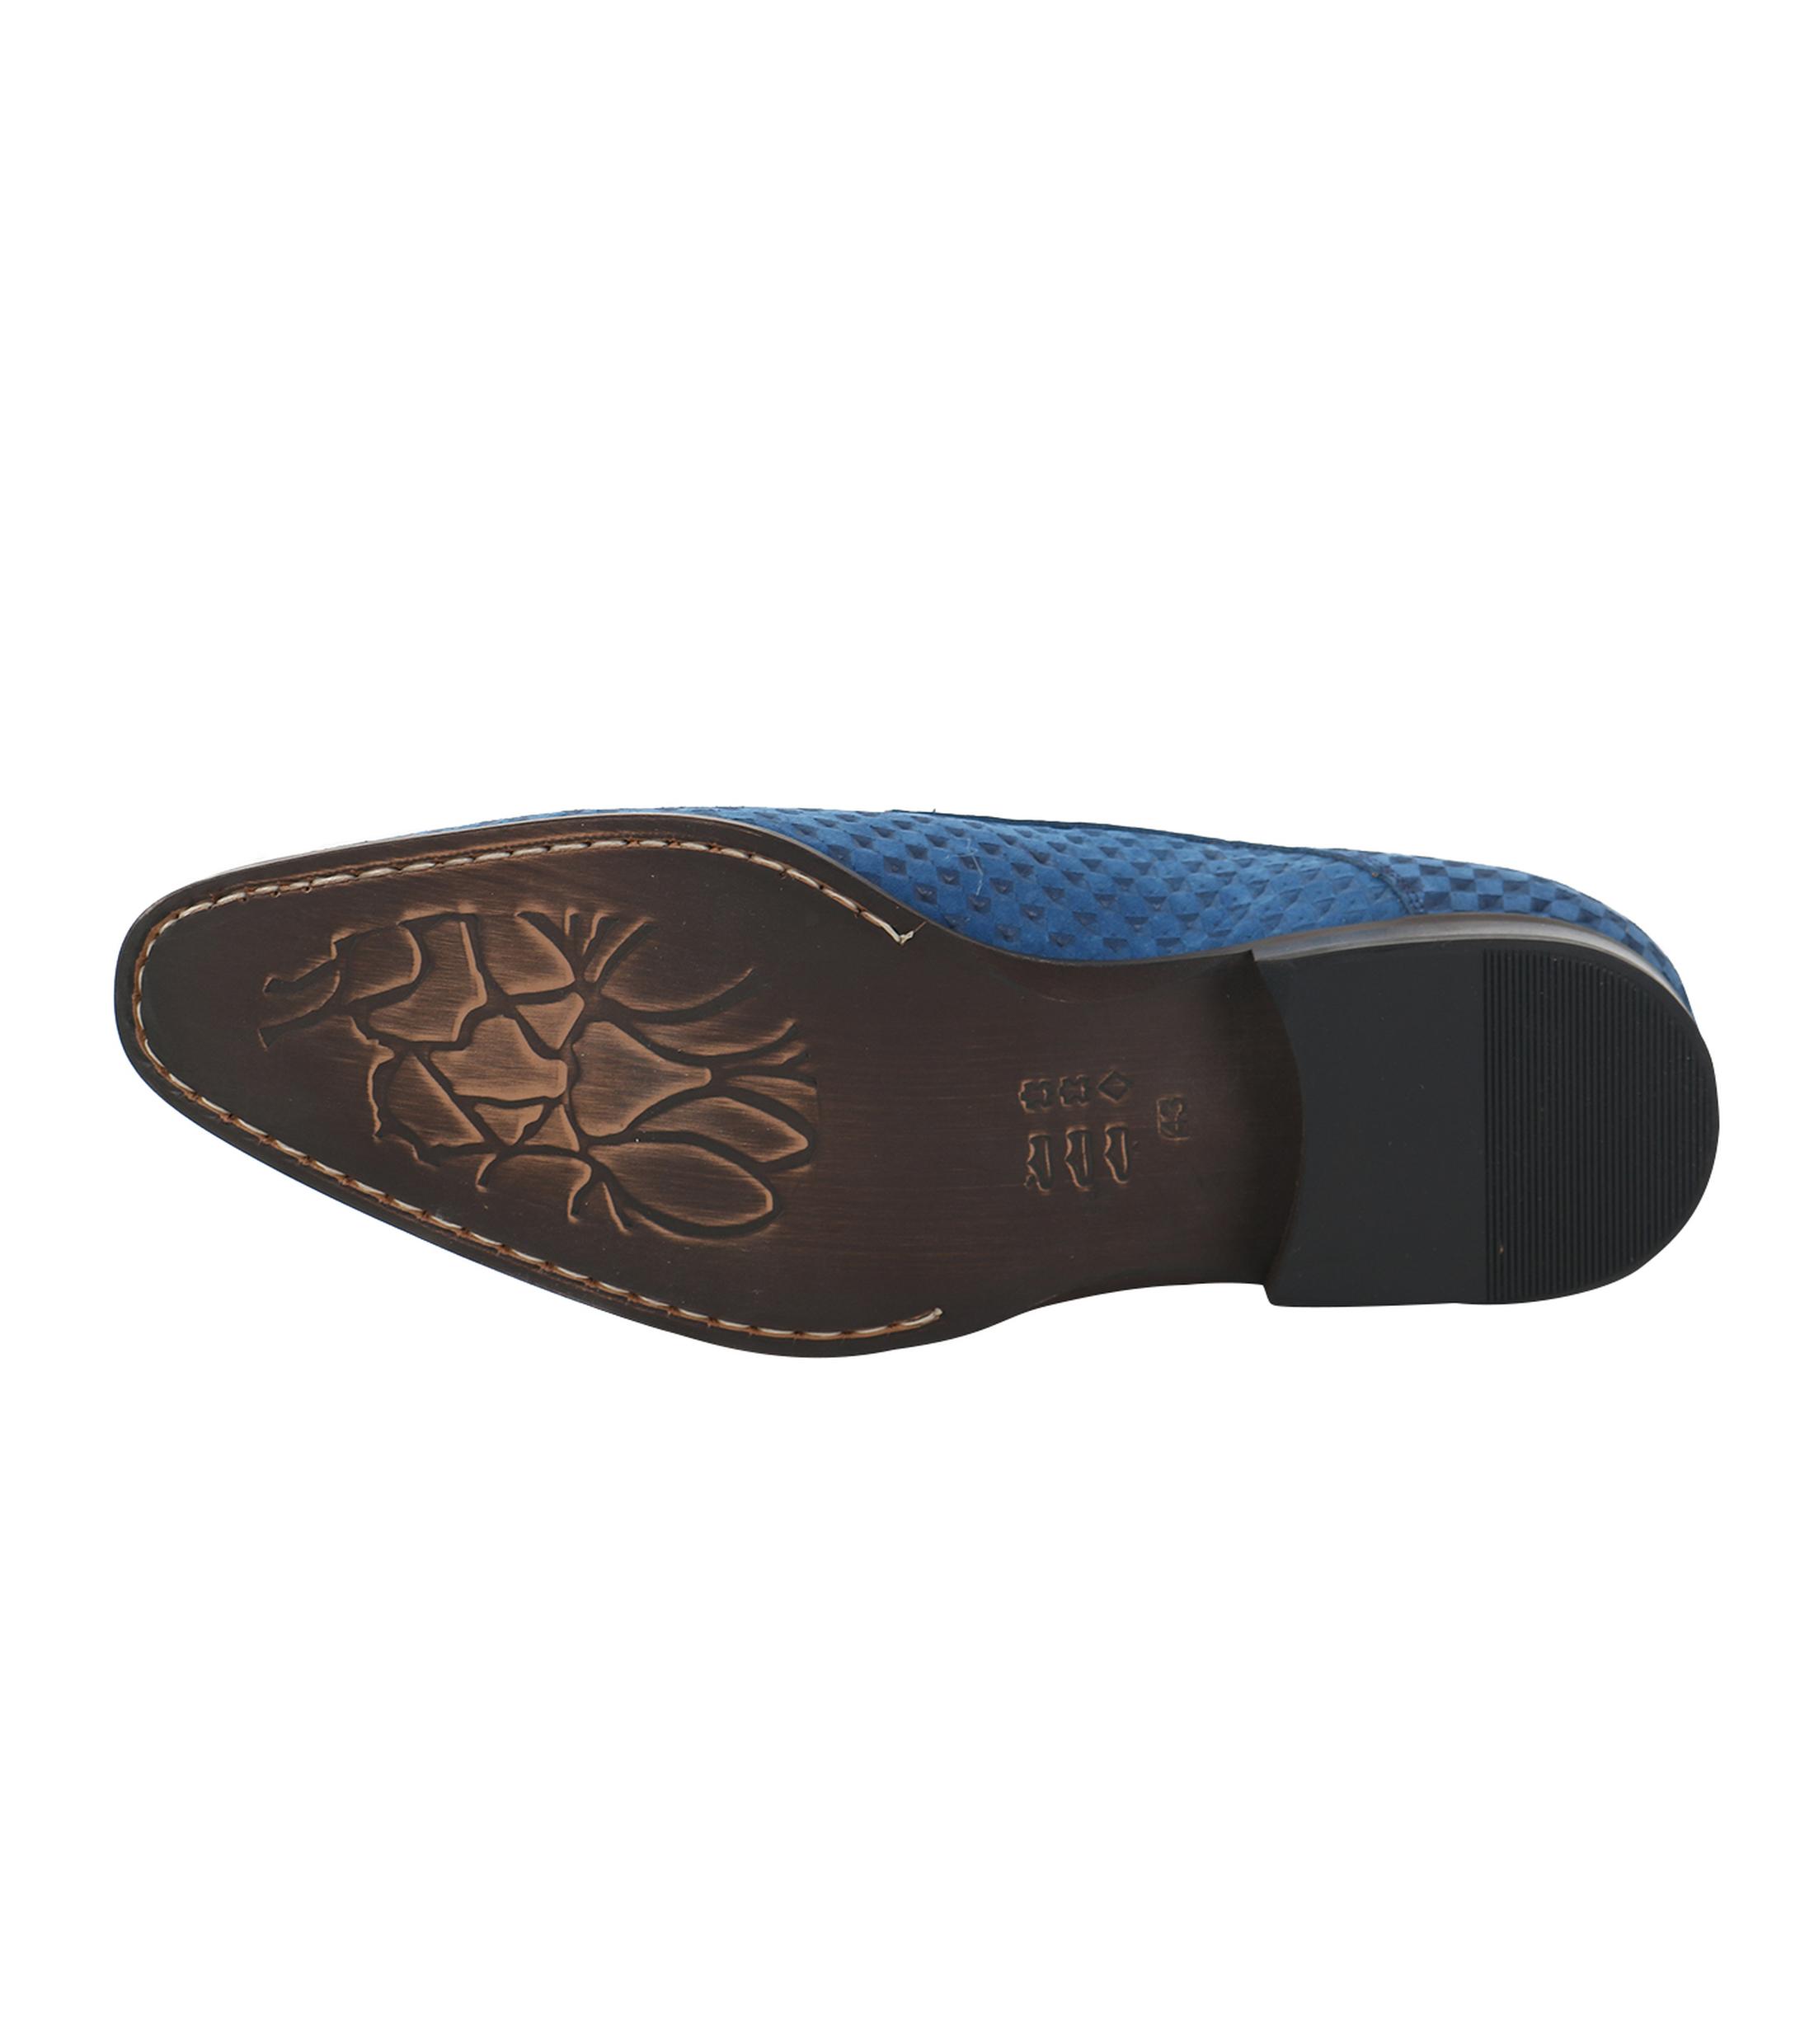 Leder Schuh Blau foto 4